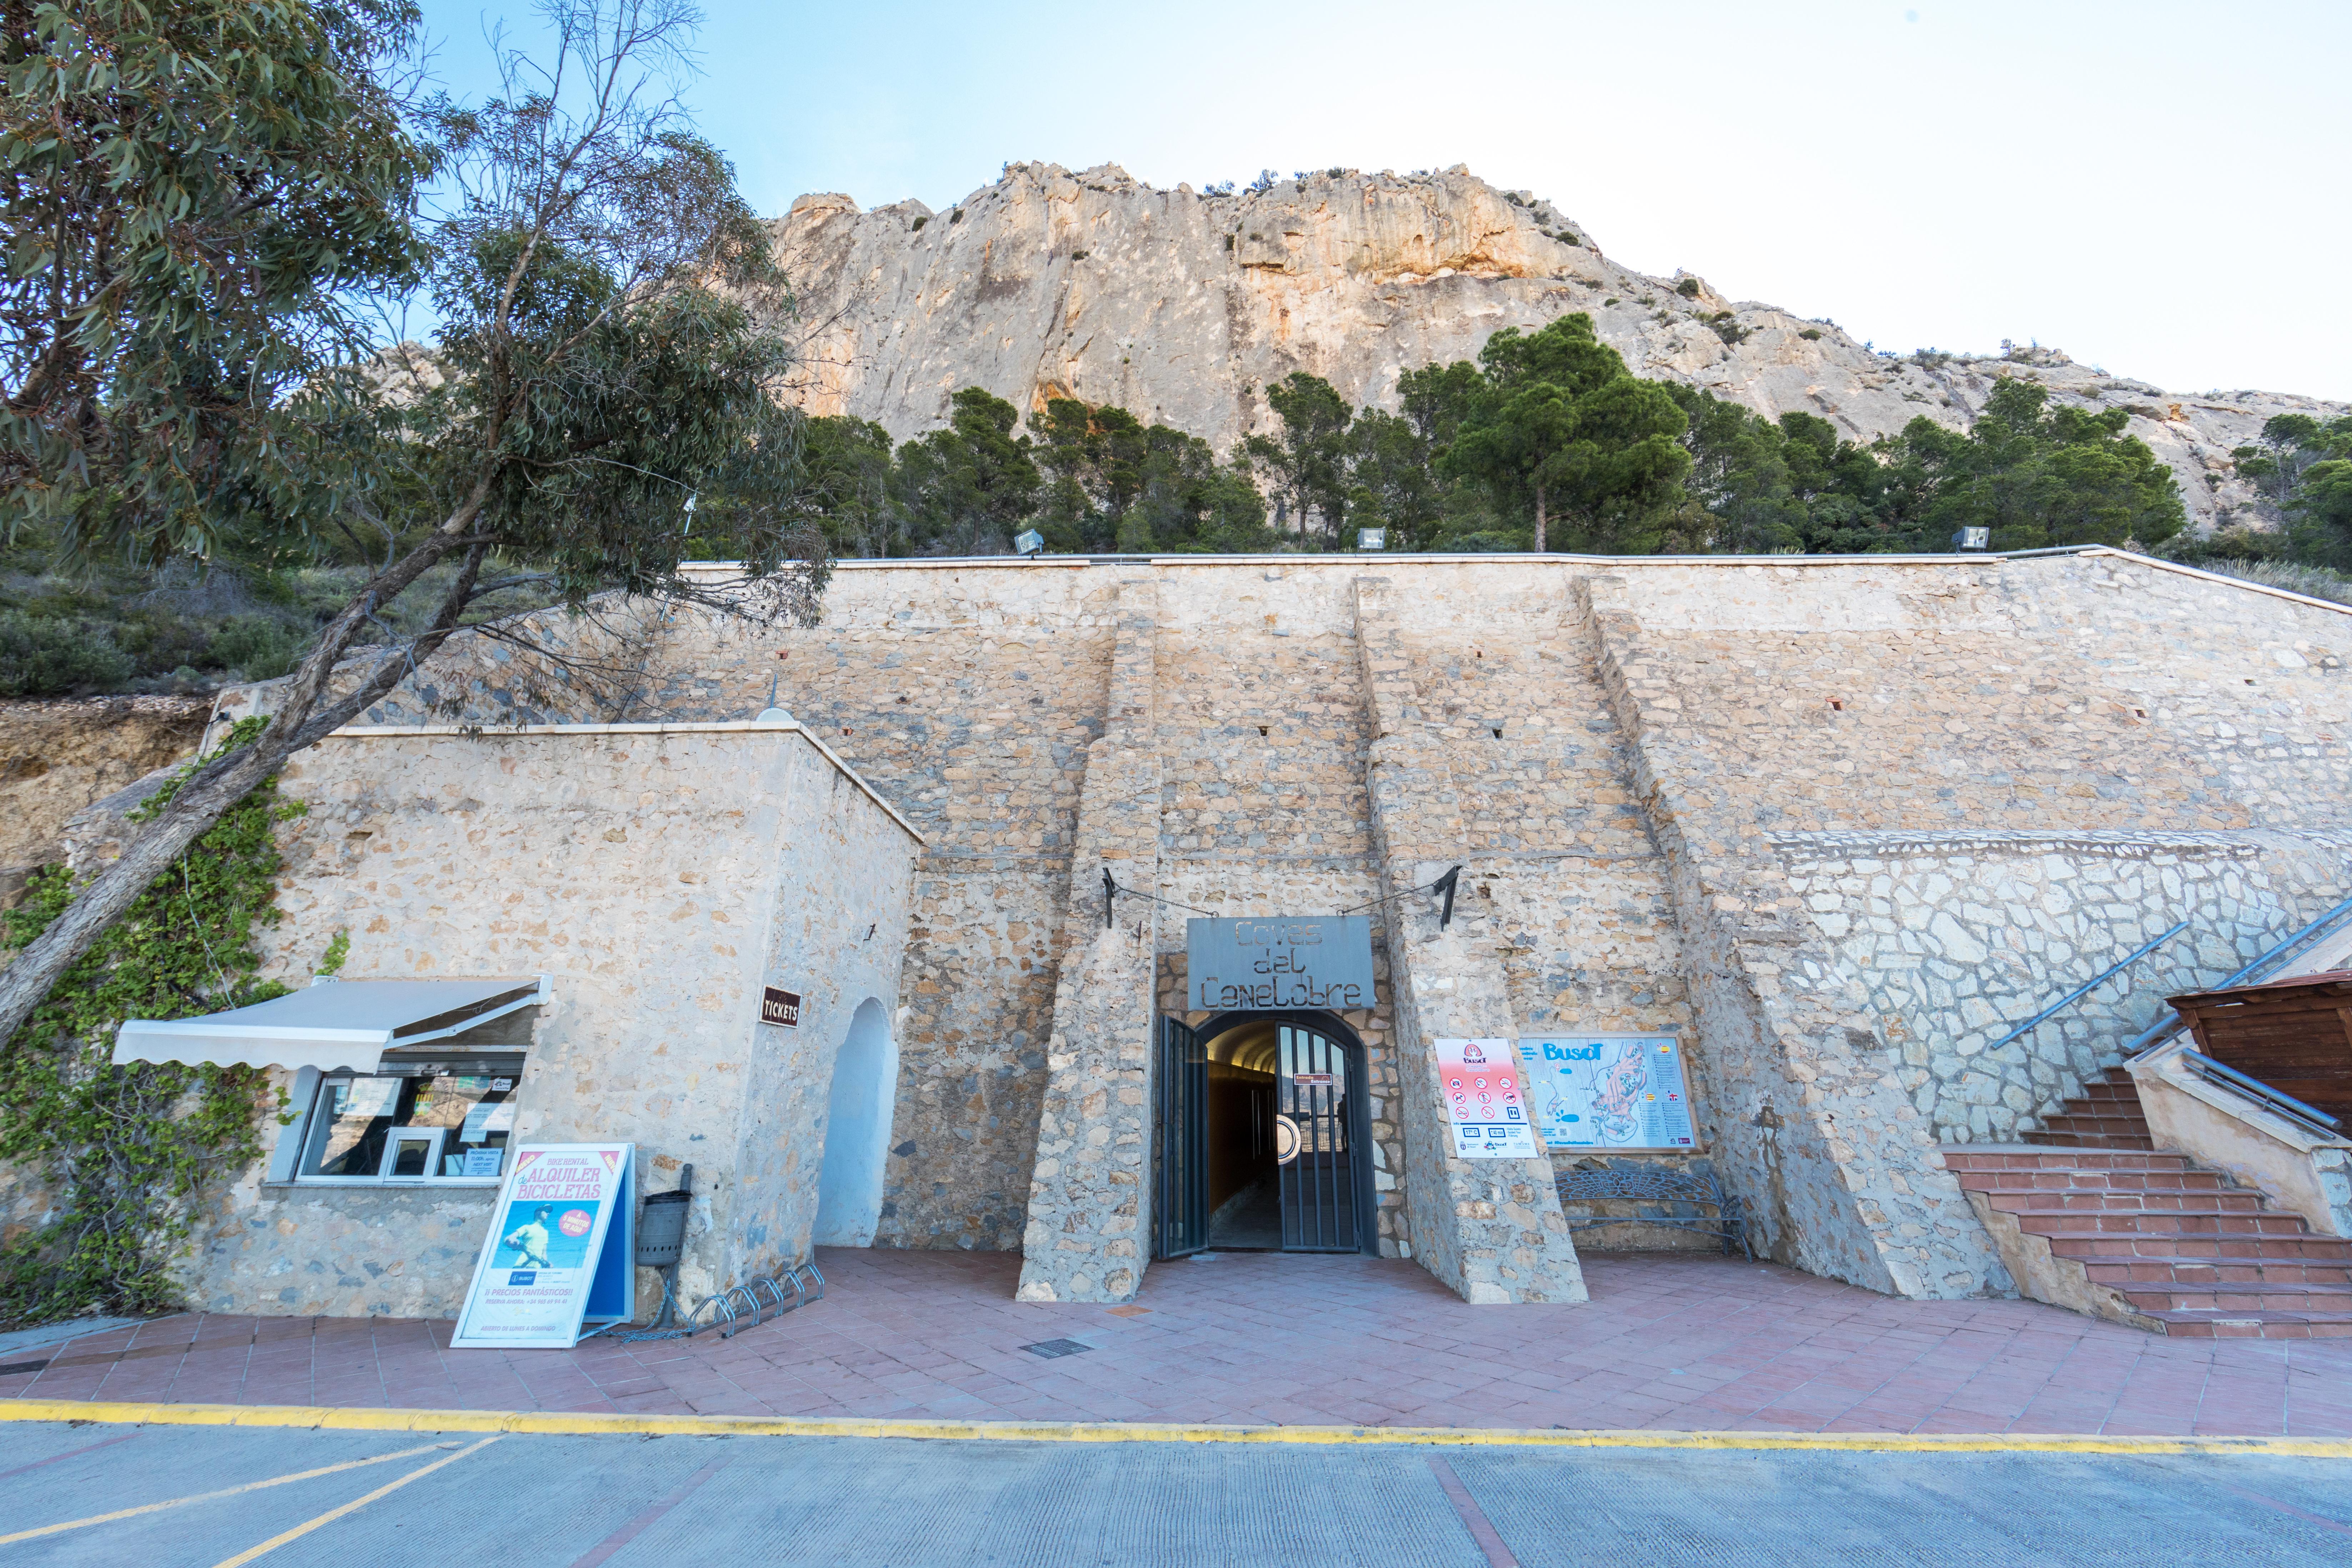 Les grottes de Canelobre